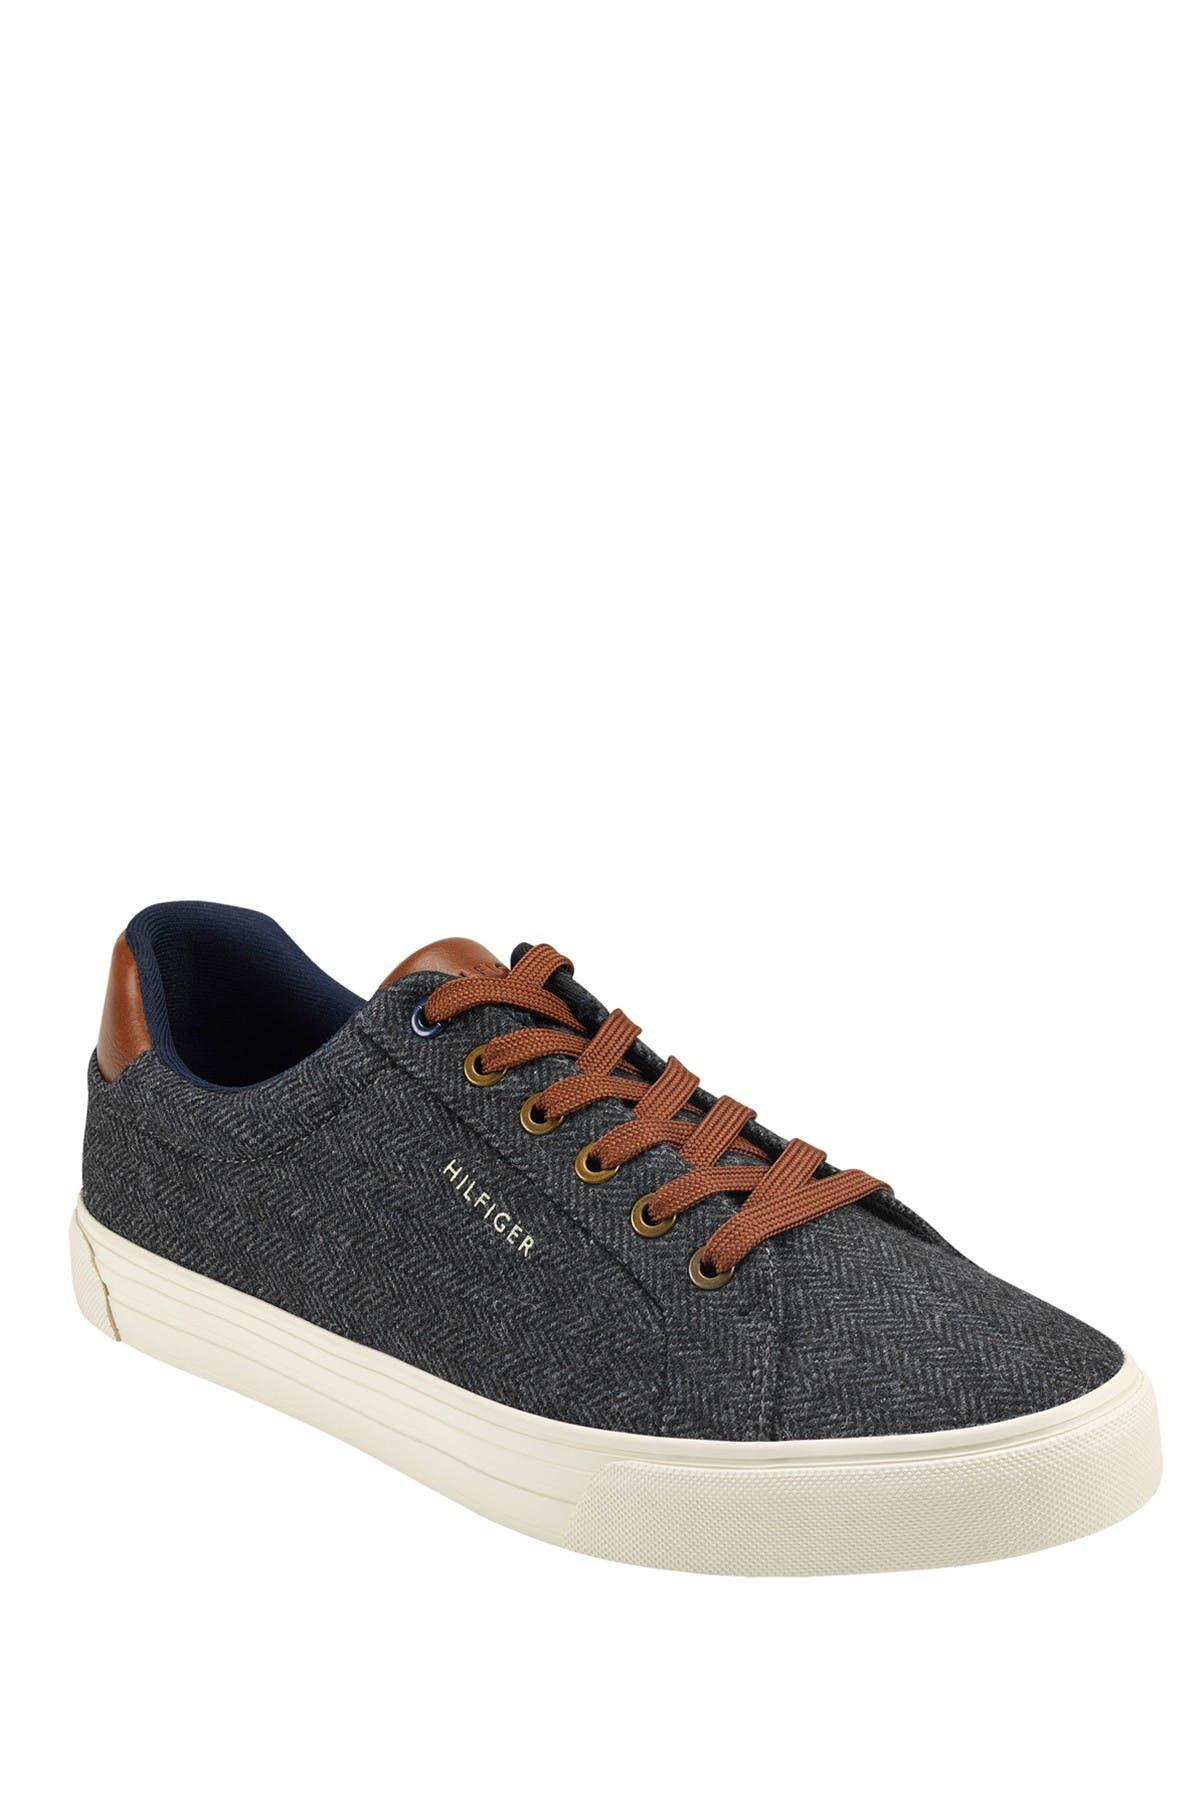 Tommy Hilfiger | Rance 3 Sneaker